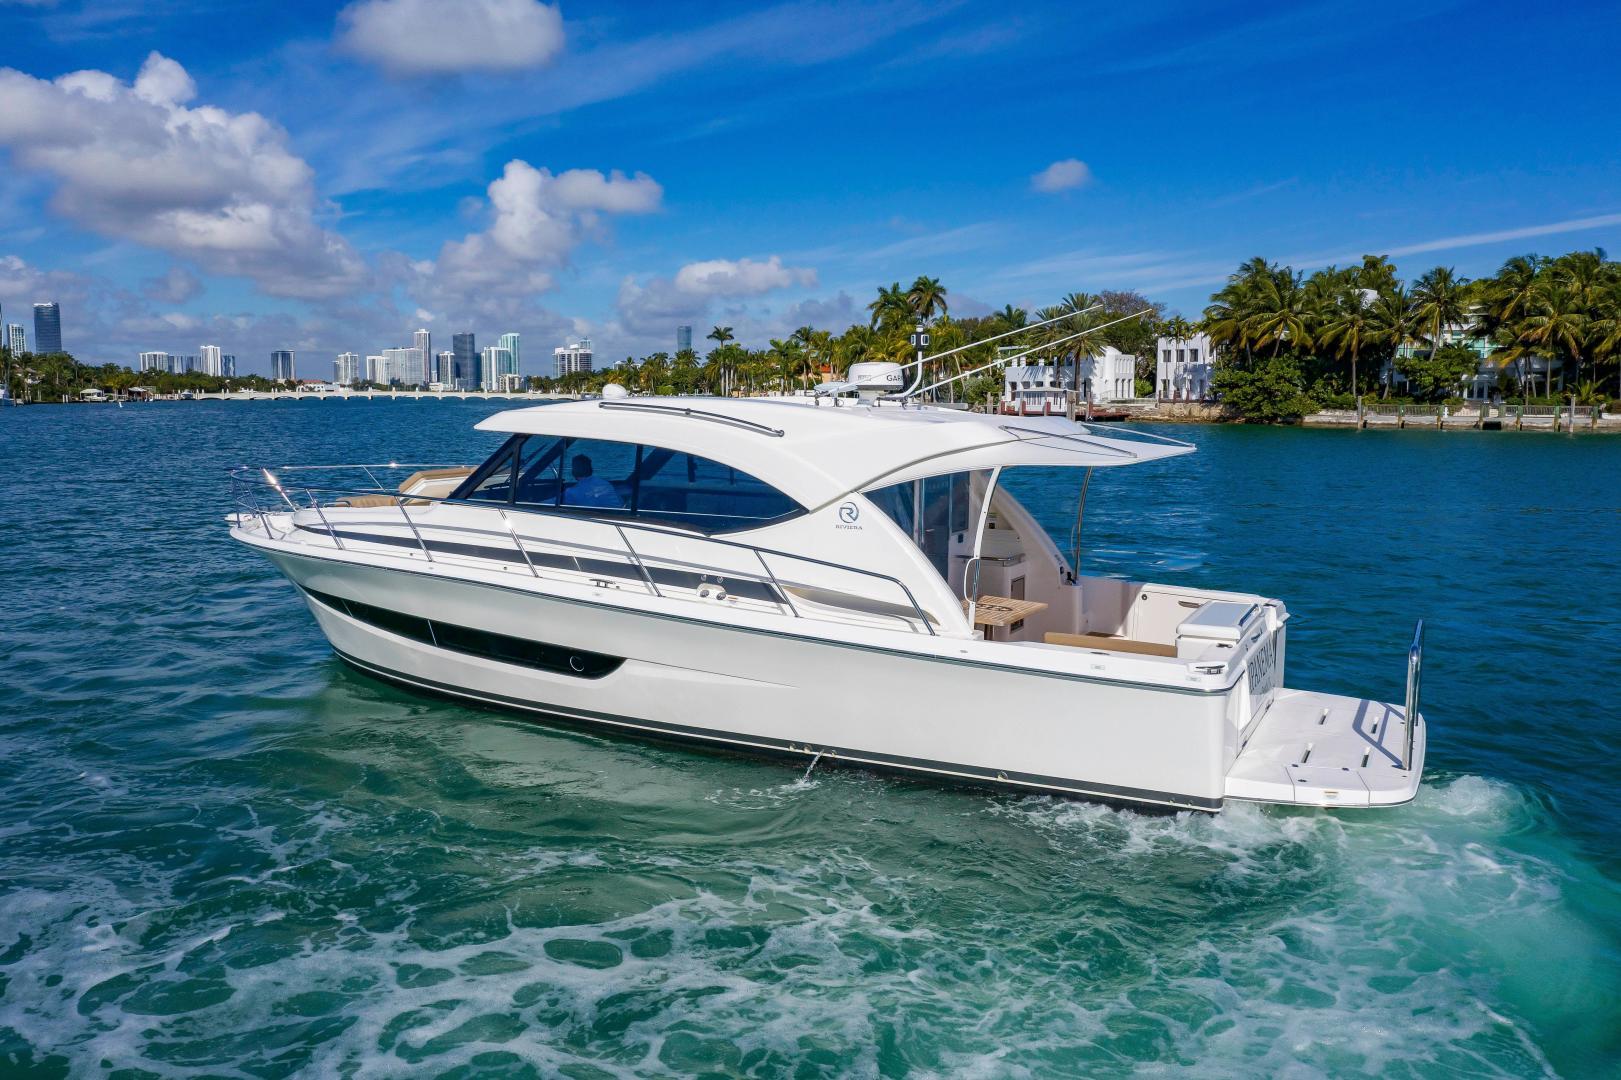 Riviera-395 SUV 2019-Ipanema Miami Beach-Florida-United States-1614874   Thumbnail